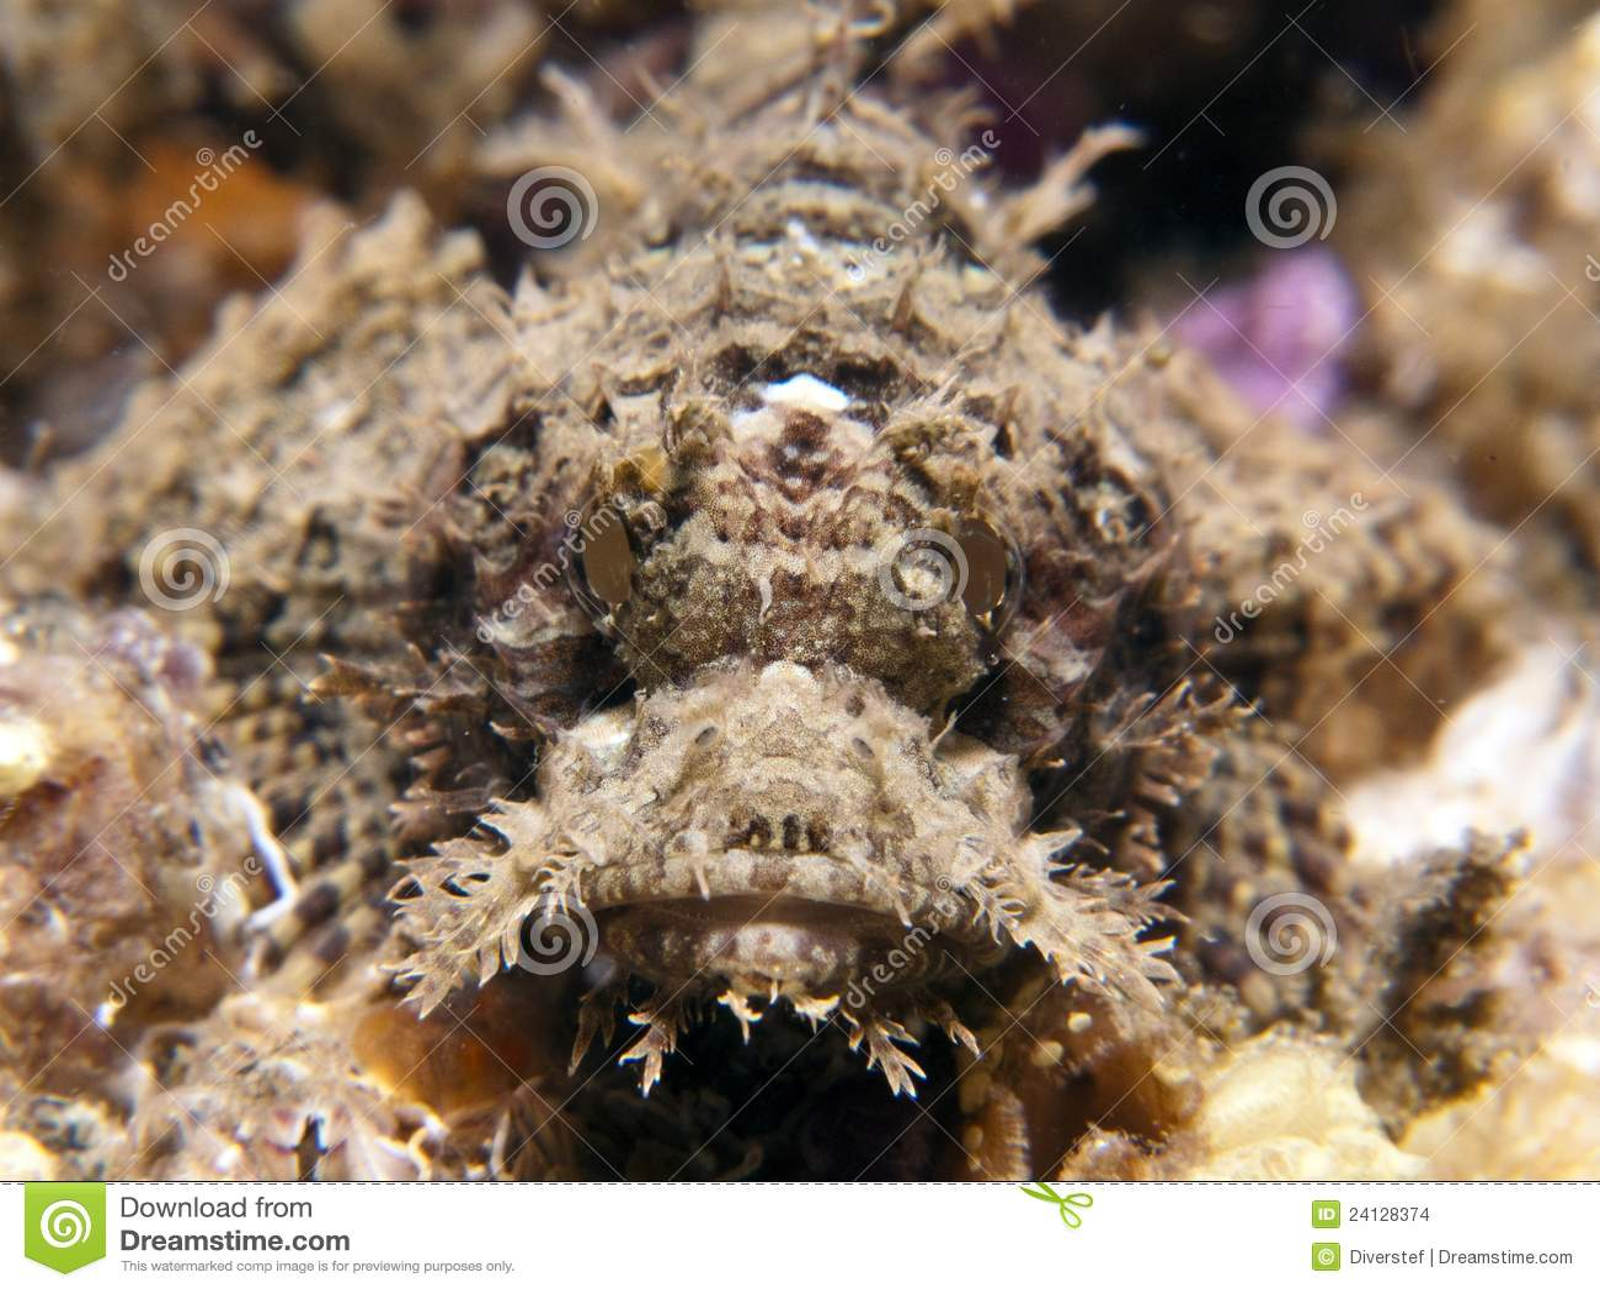 Raggy scorpaenopsisscorpianfishvenosa